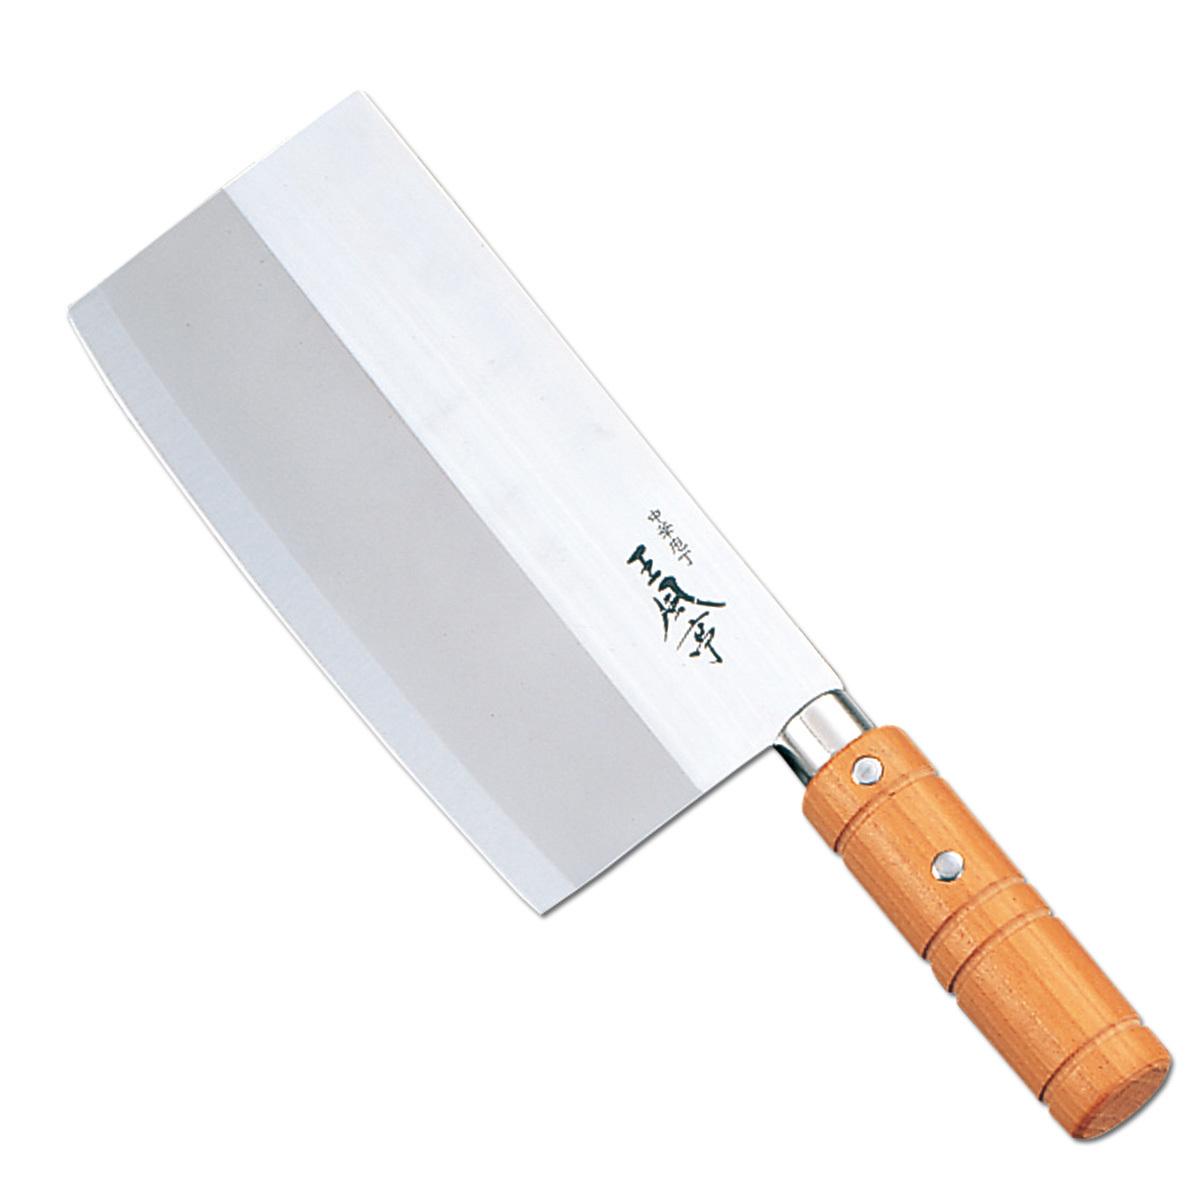 Топорик кухонный Special series, Tojiro, 175 мм, сталь AUS-8Tojiro<br>Топорик кухонный Special series 175 мм, сталь AUS-8<br>